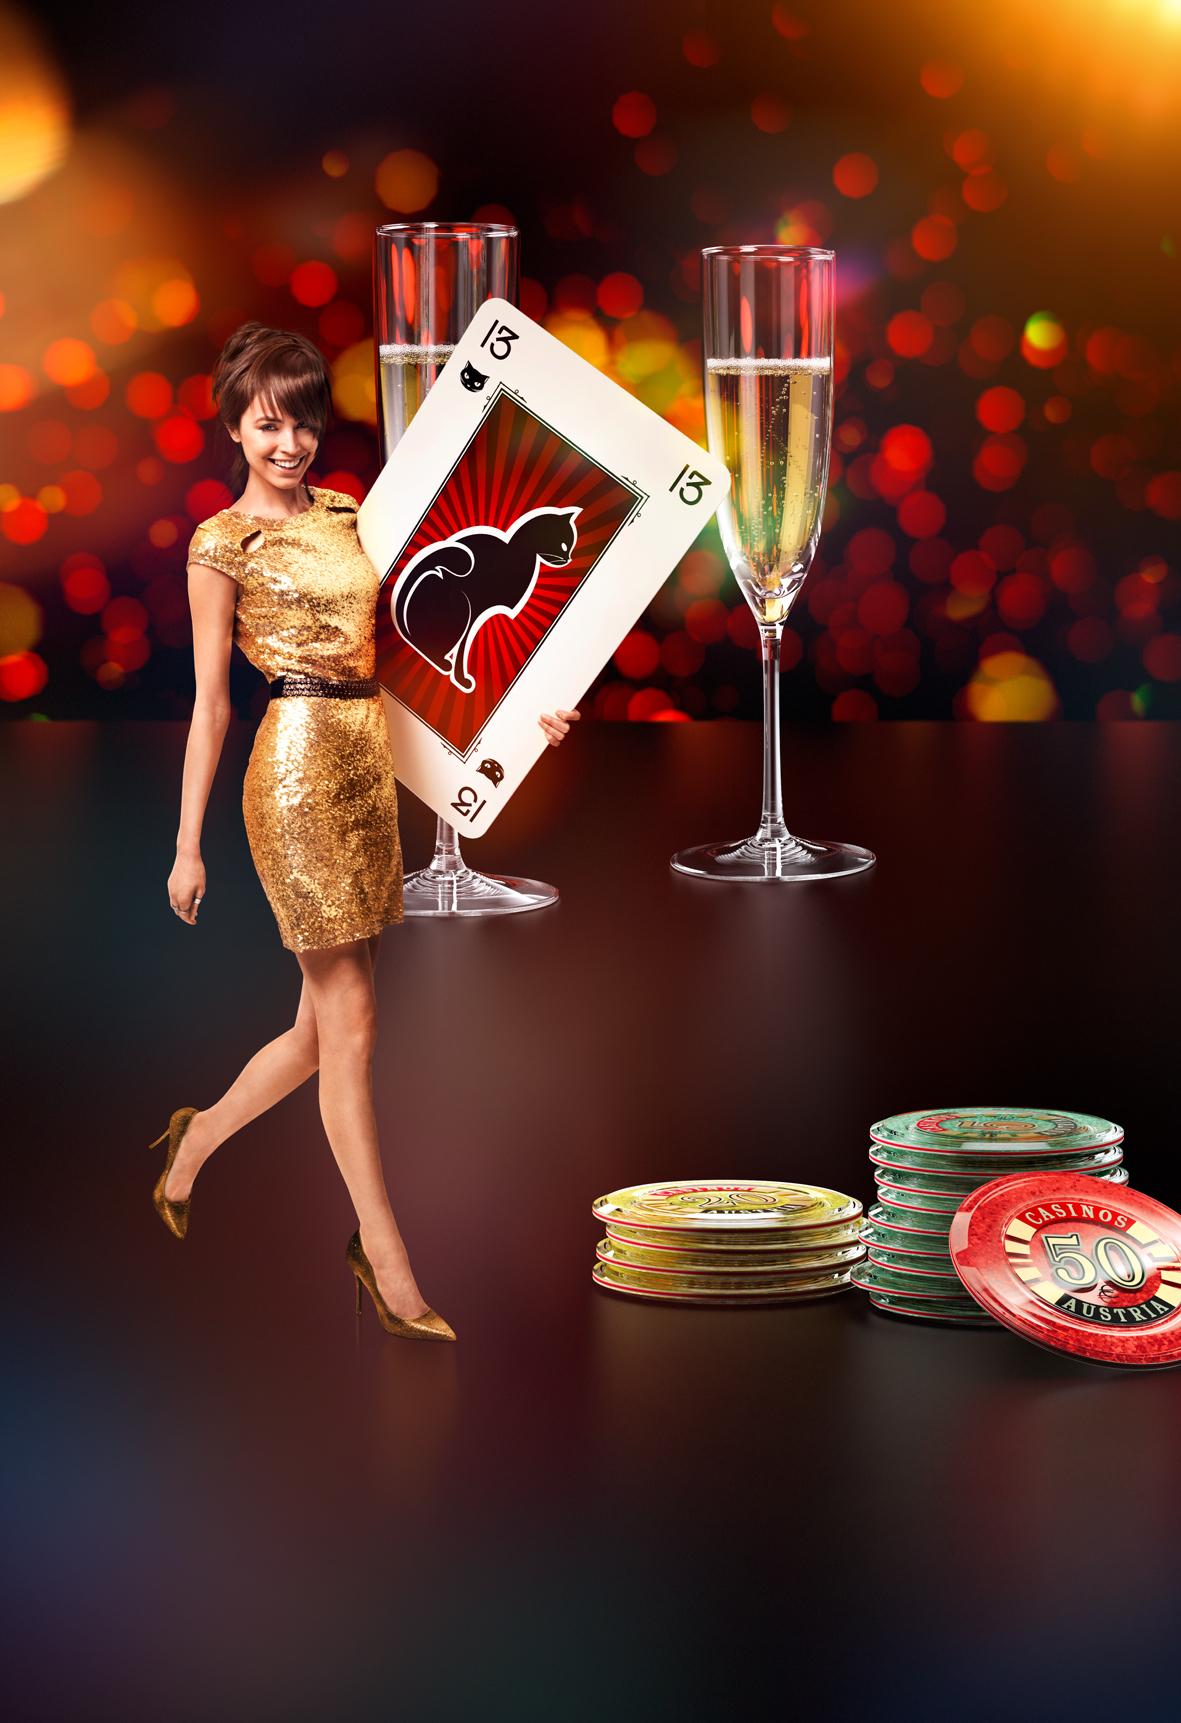 Zahlt auf Kreditkarten Wishmaker -491135